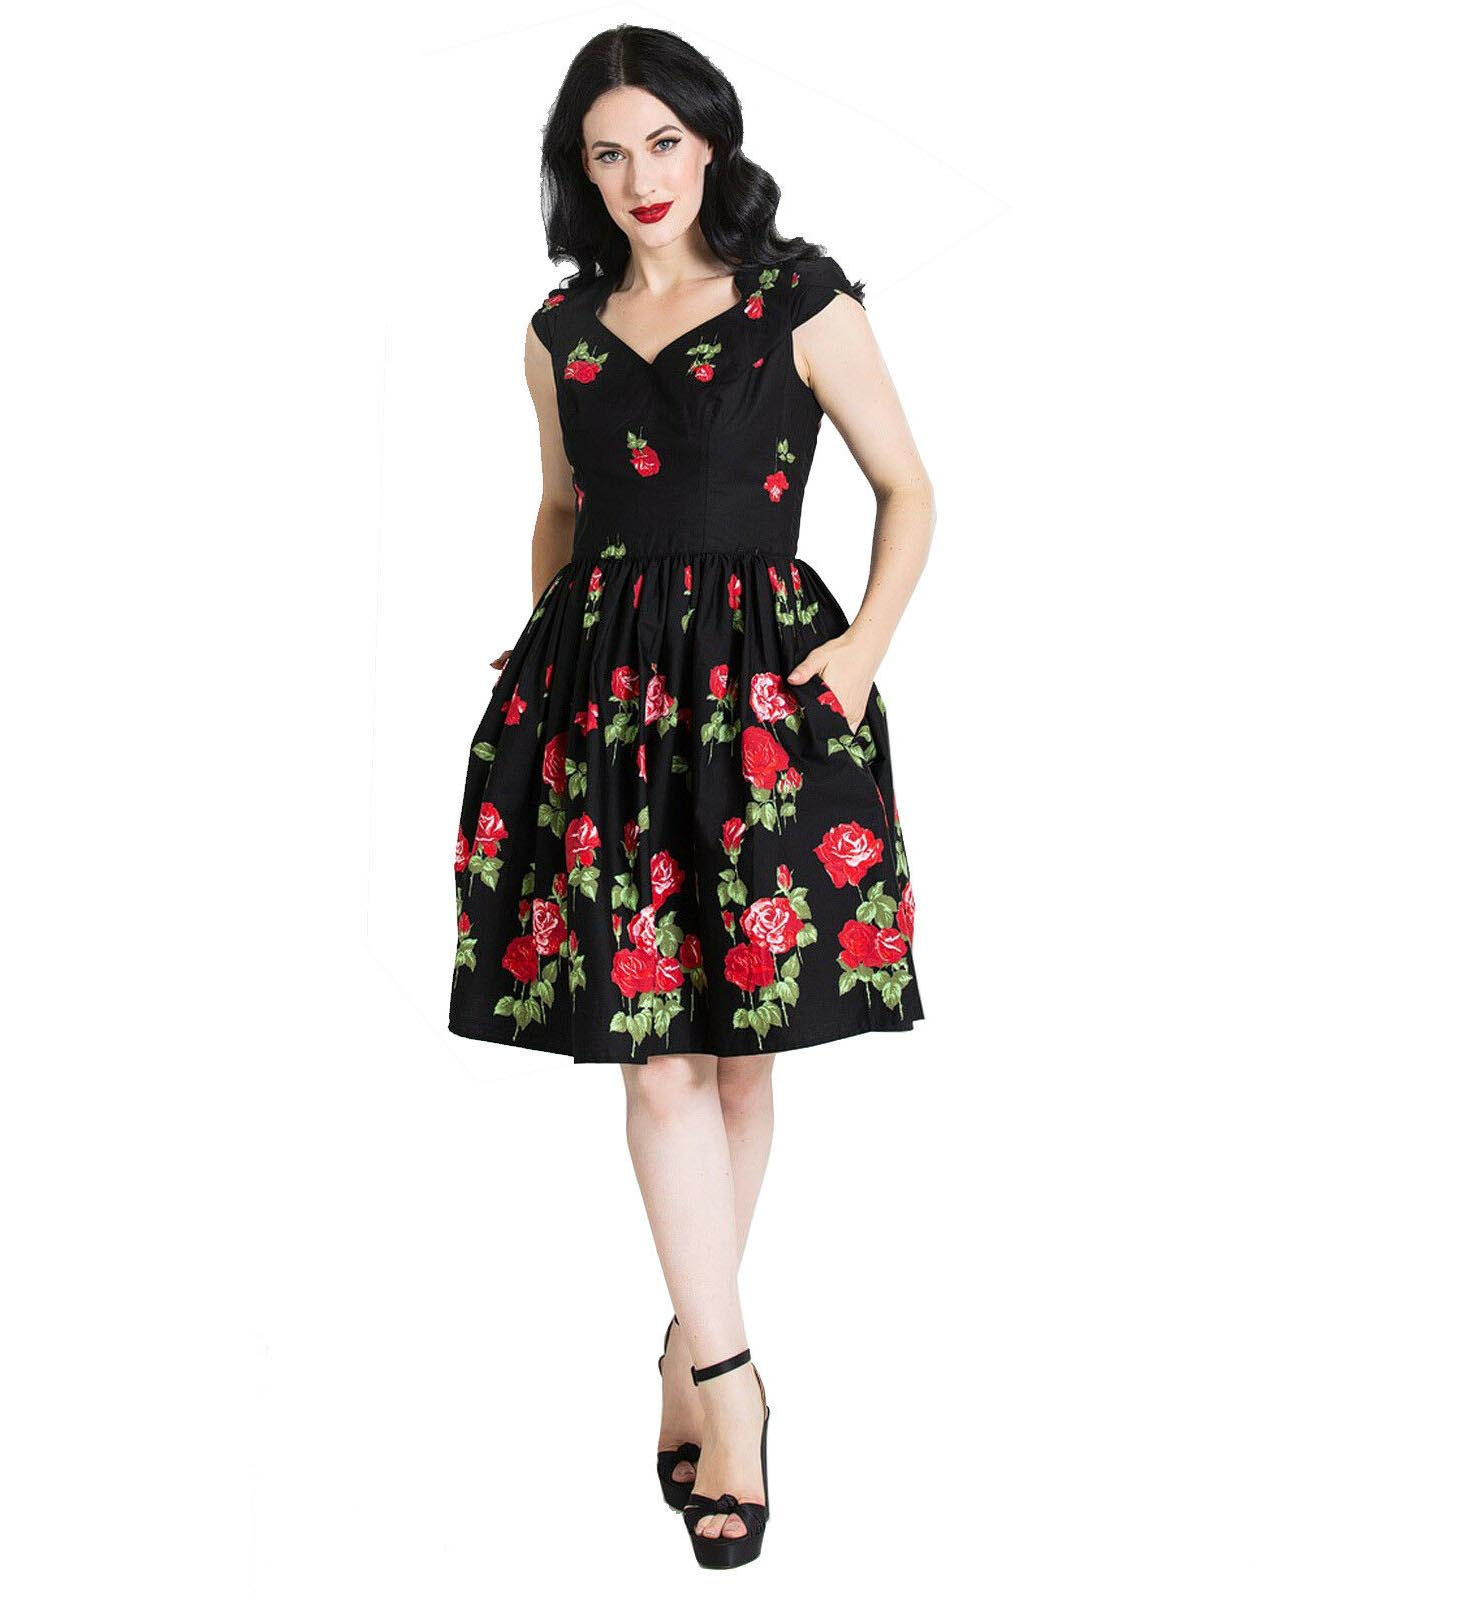 Hell-Bunny-Pin-Up-Mid-Length-50s-Dress-ANTONIA-Rose-Floral-Black thumbnail 3